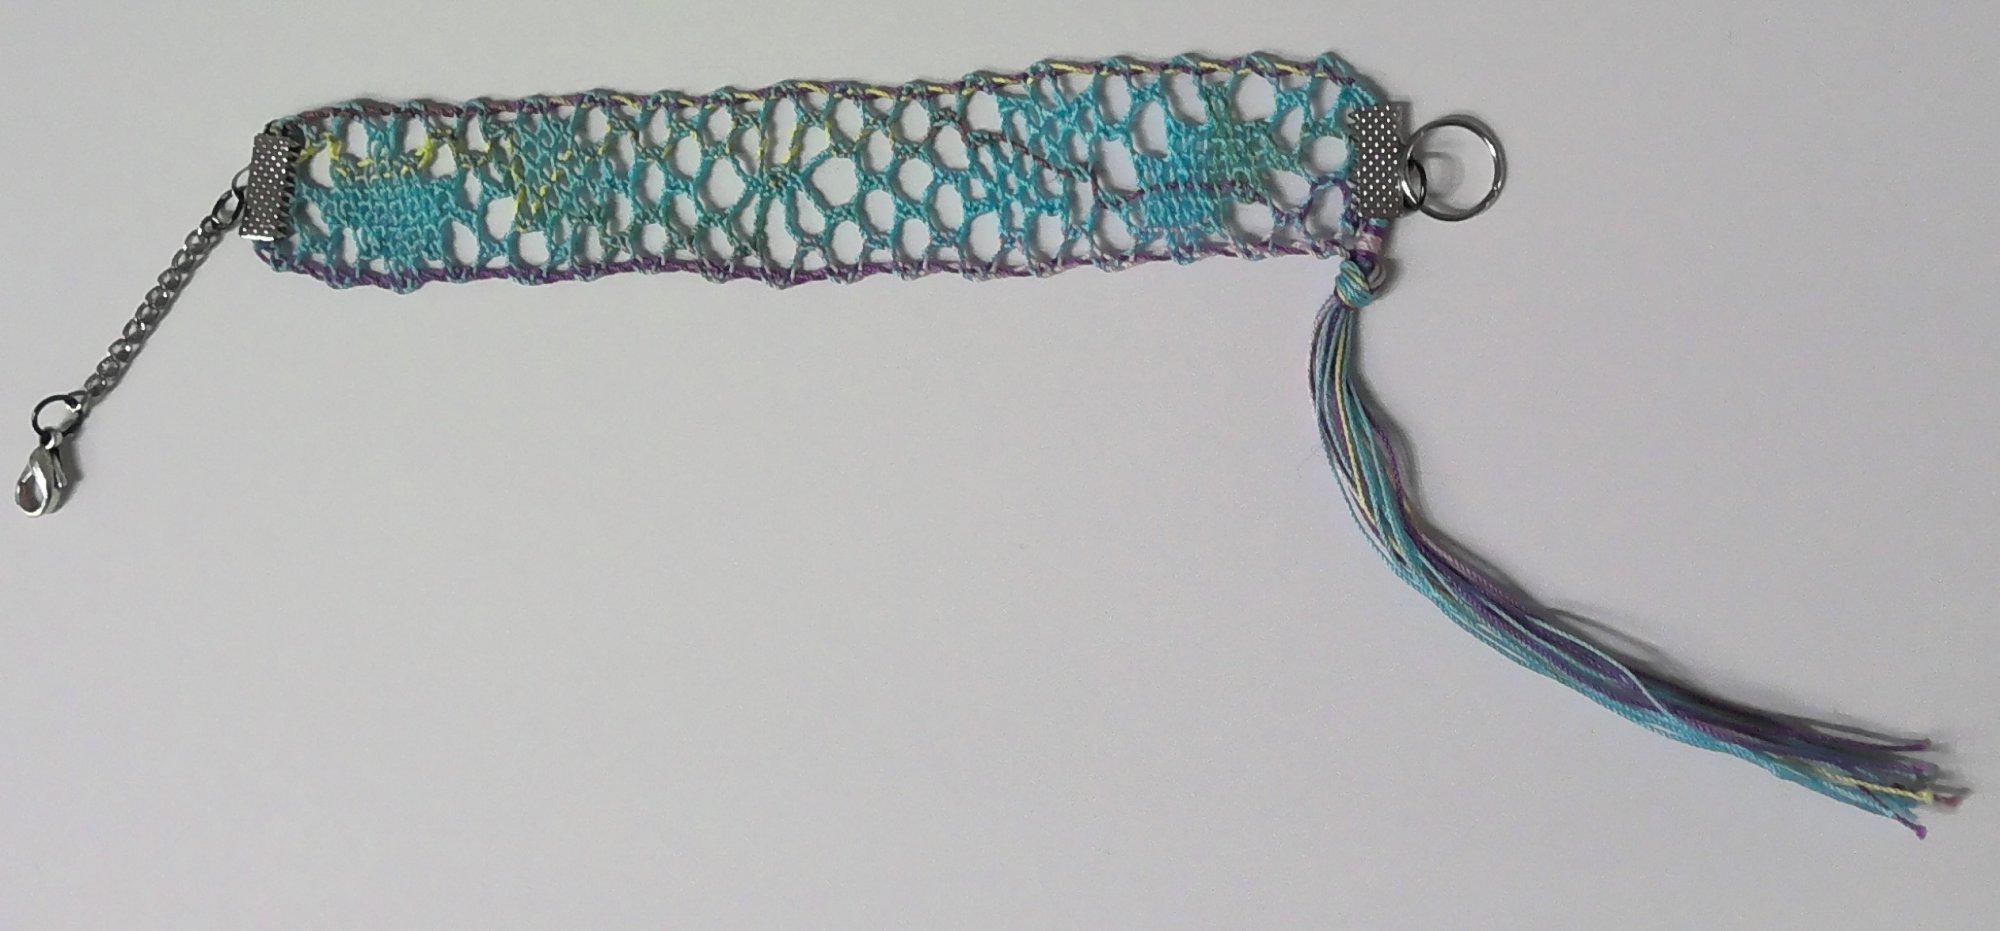 Lace Bracelets - Handmade